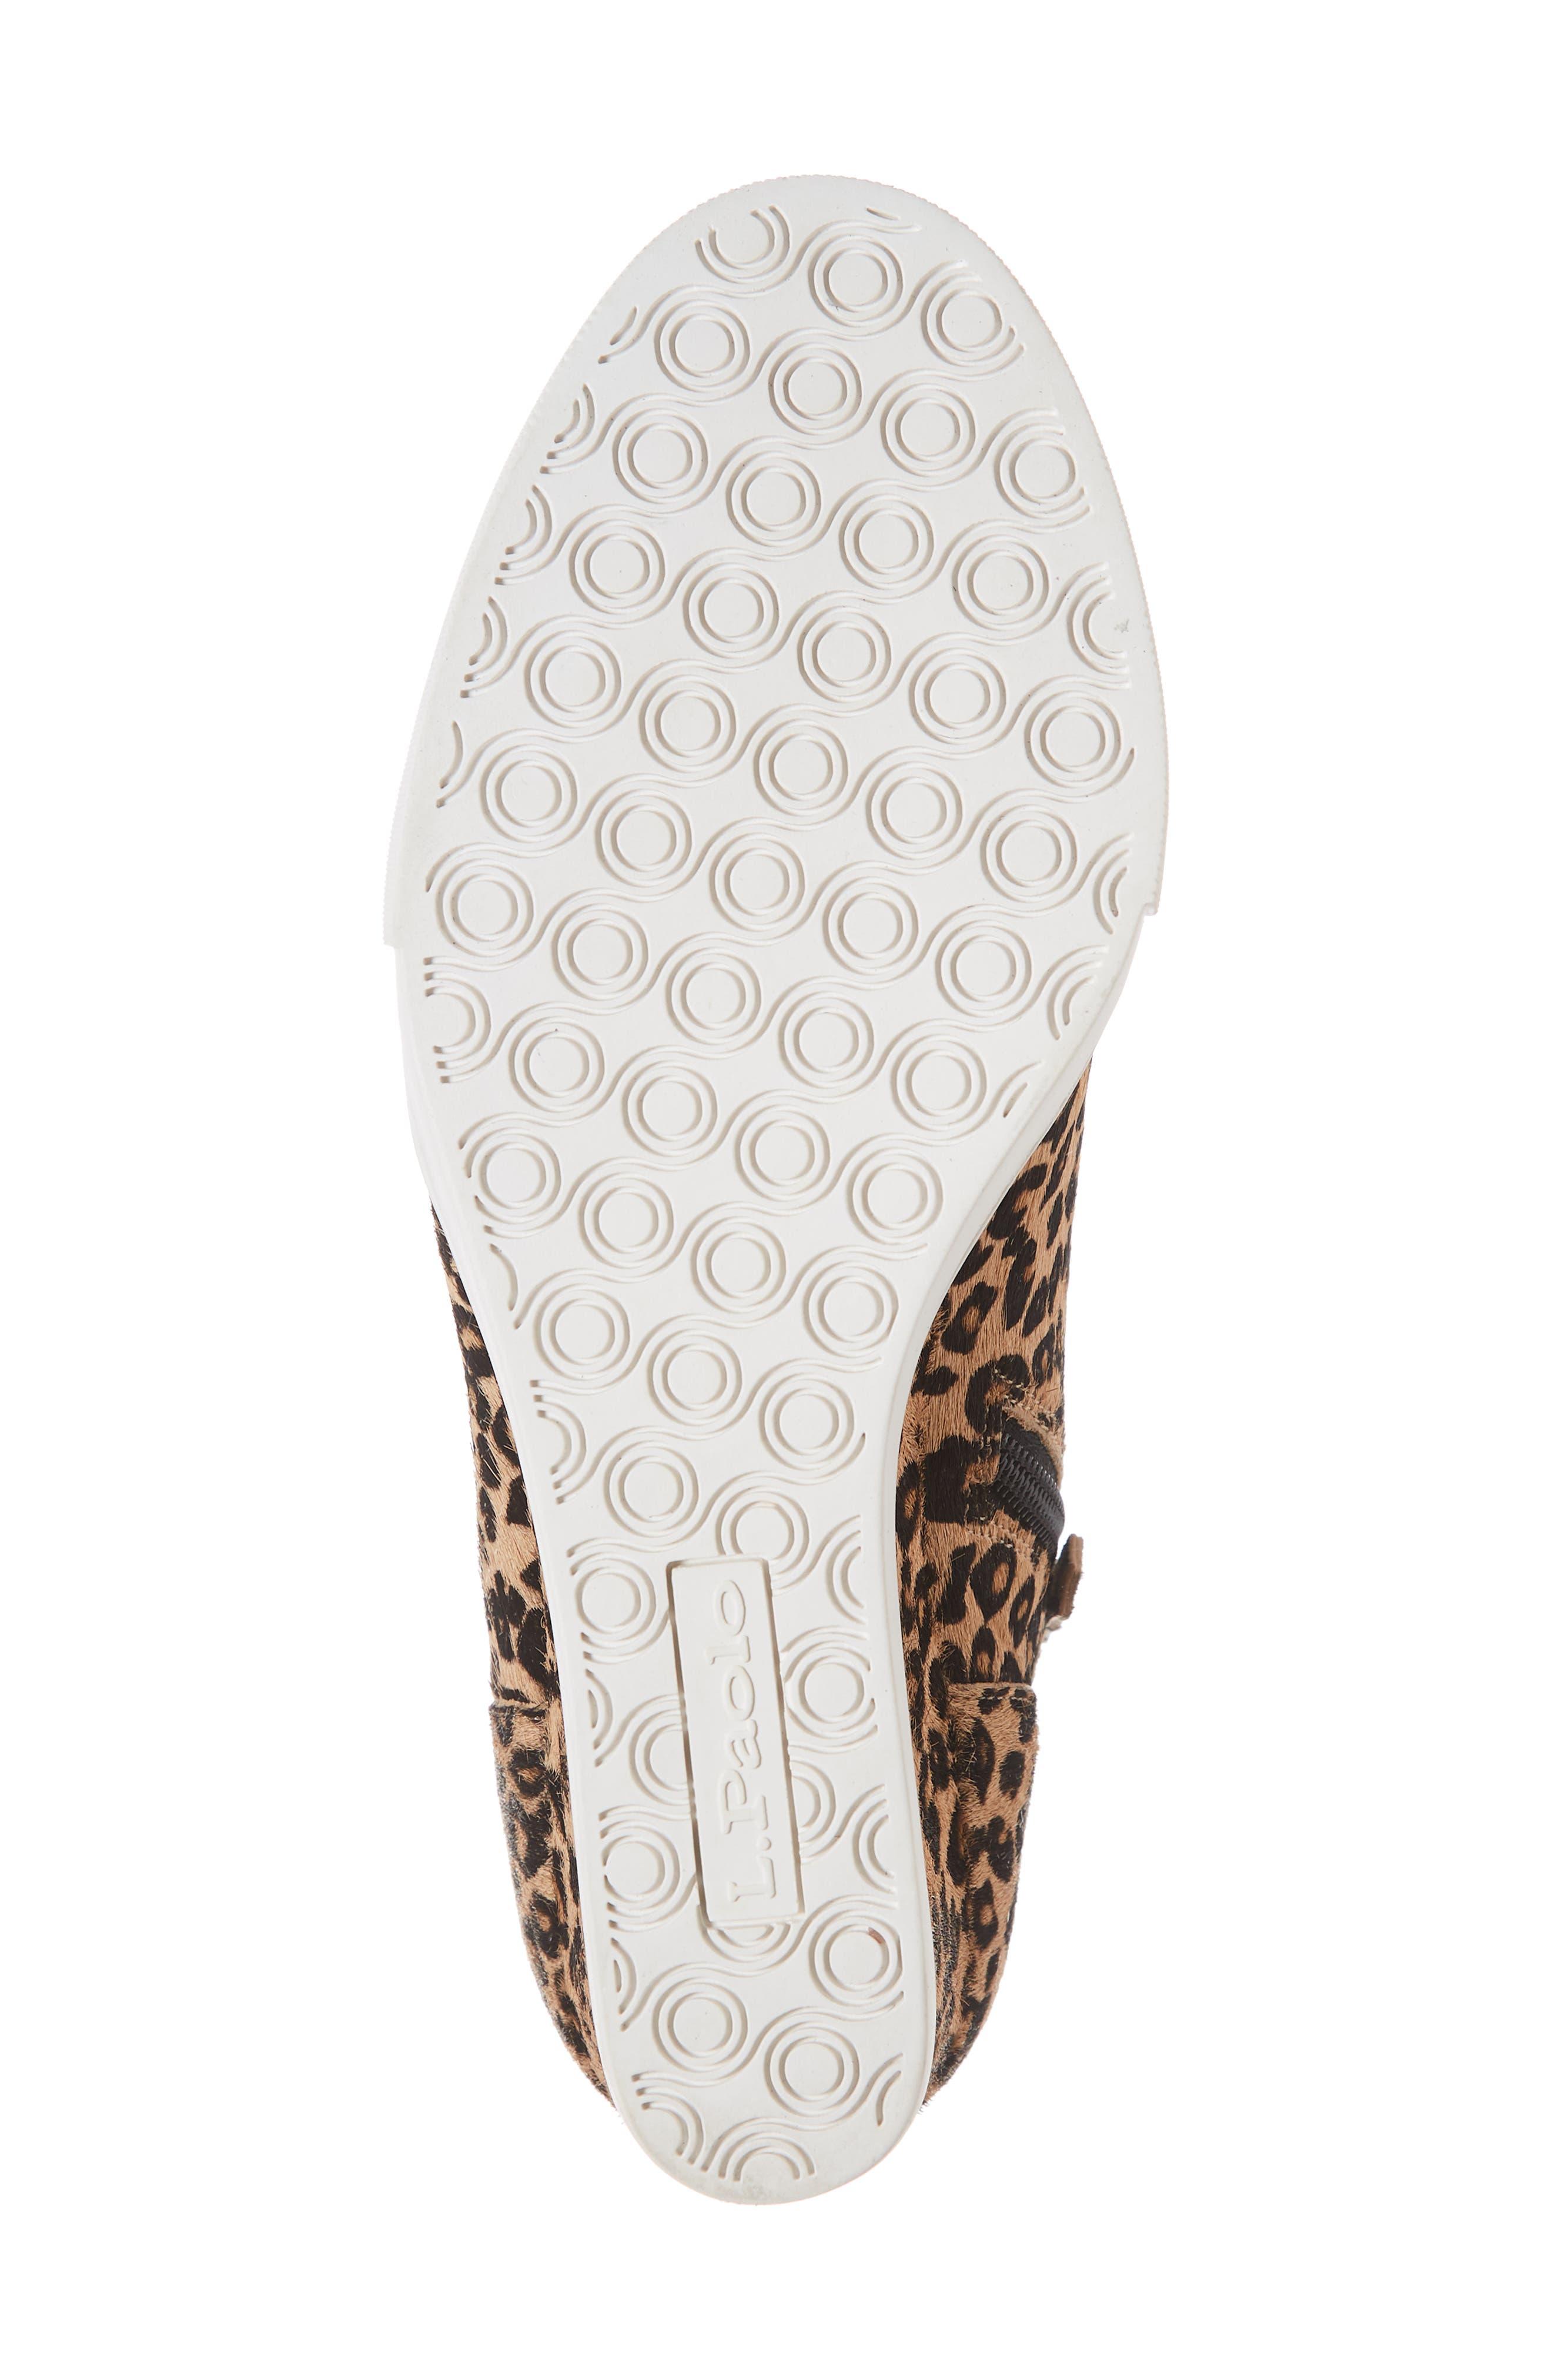 LINEA PAOLO, Felicia III Genuine Calf Hair Wedge Sneaker, Alternate thumbnail 6, color, LEOPARD PRINT HAIR CALF